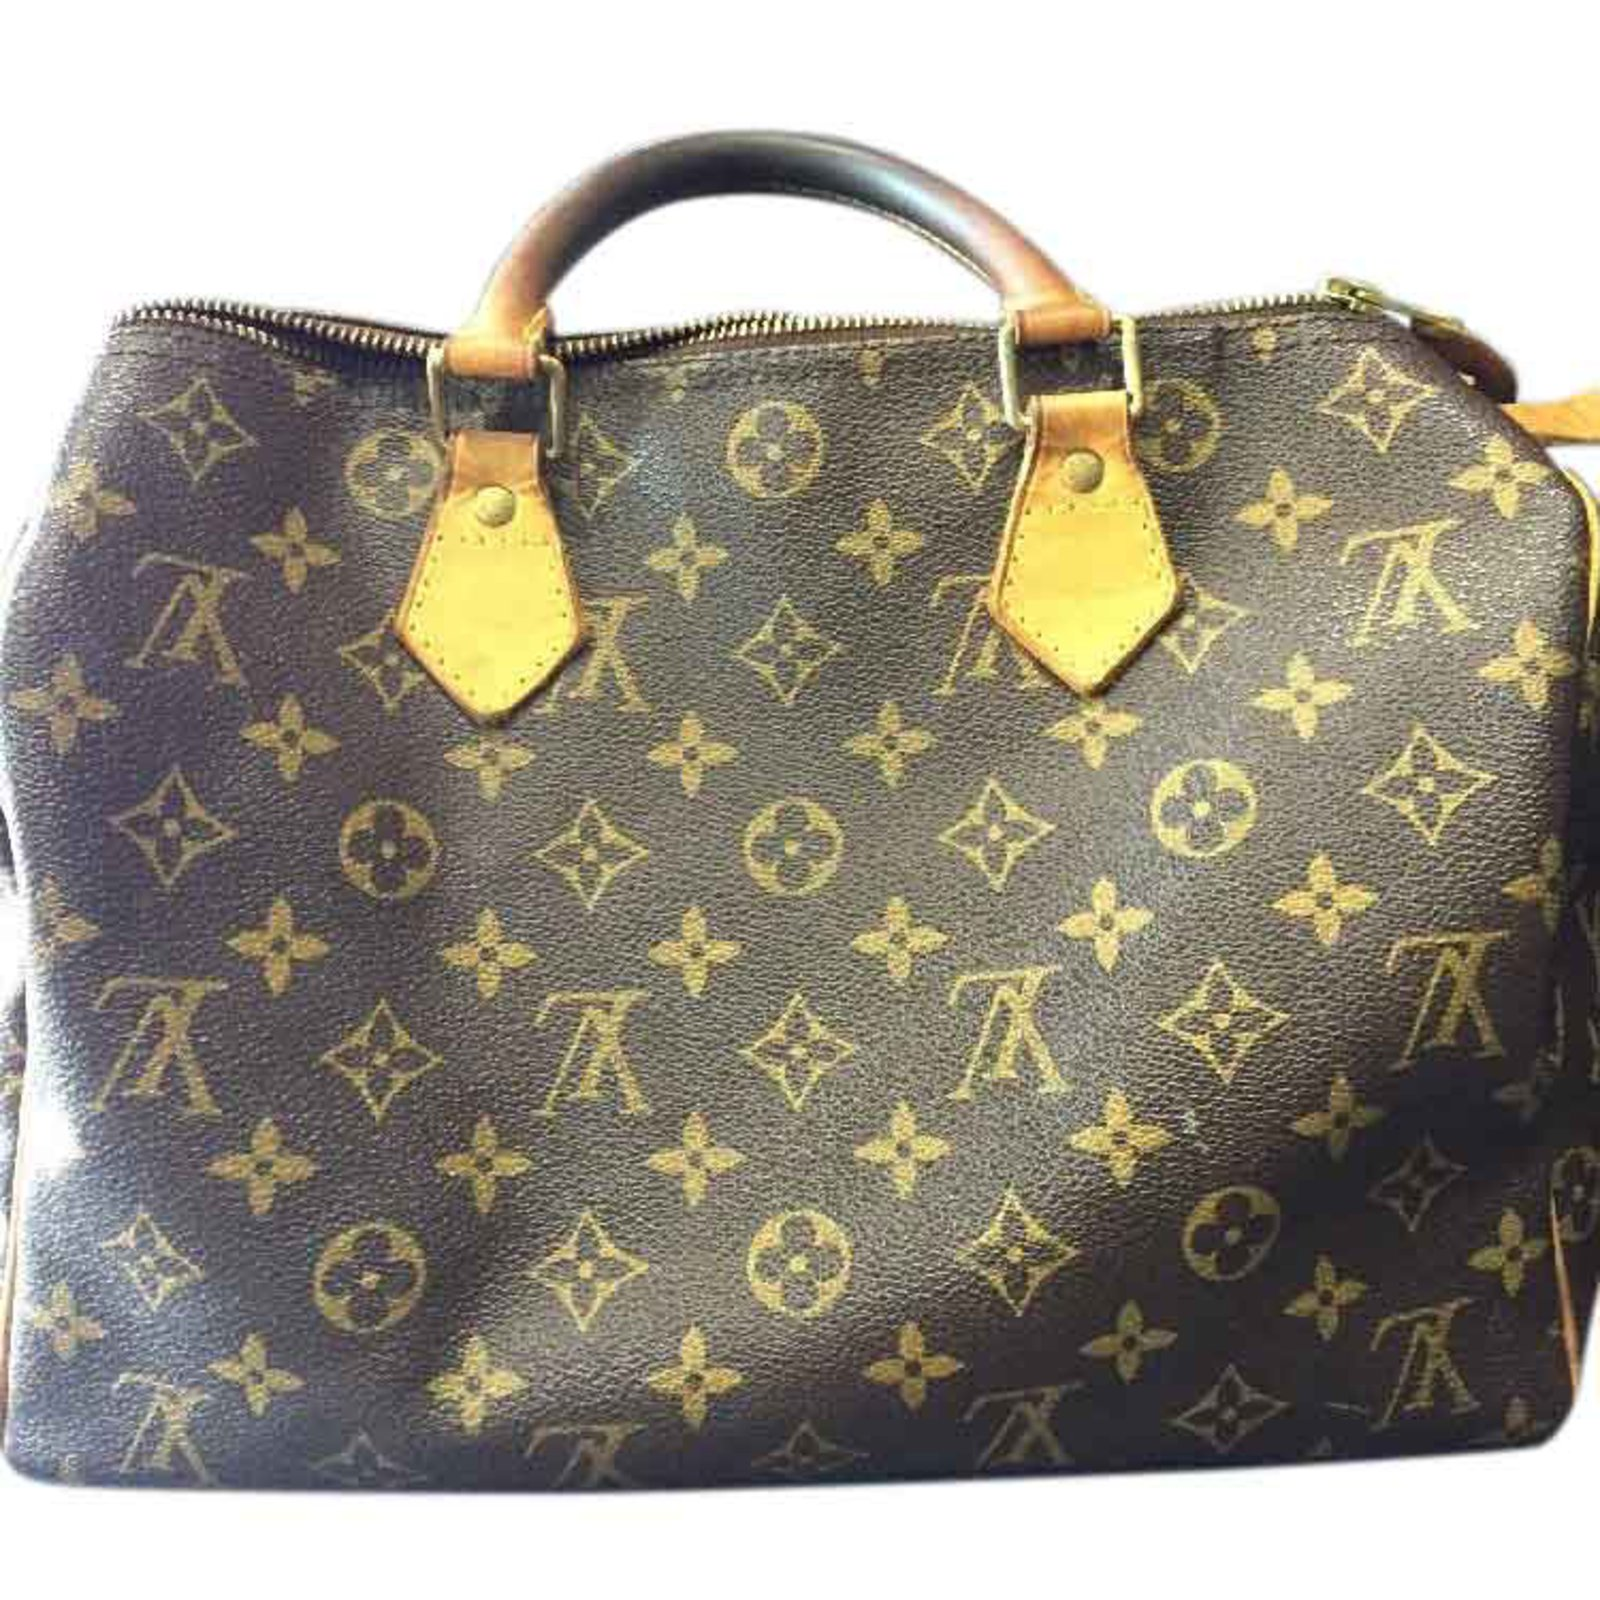 277468ae2c3d Sacs à main Louis Vuitton Speedy 35 Toile Marron ref.25600 - Joli Closet